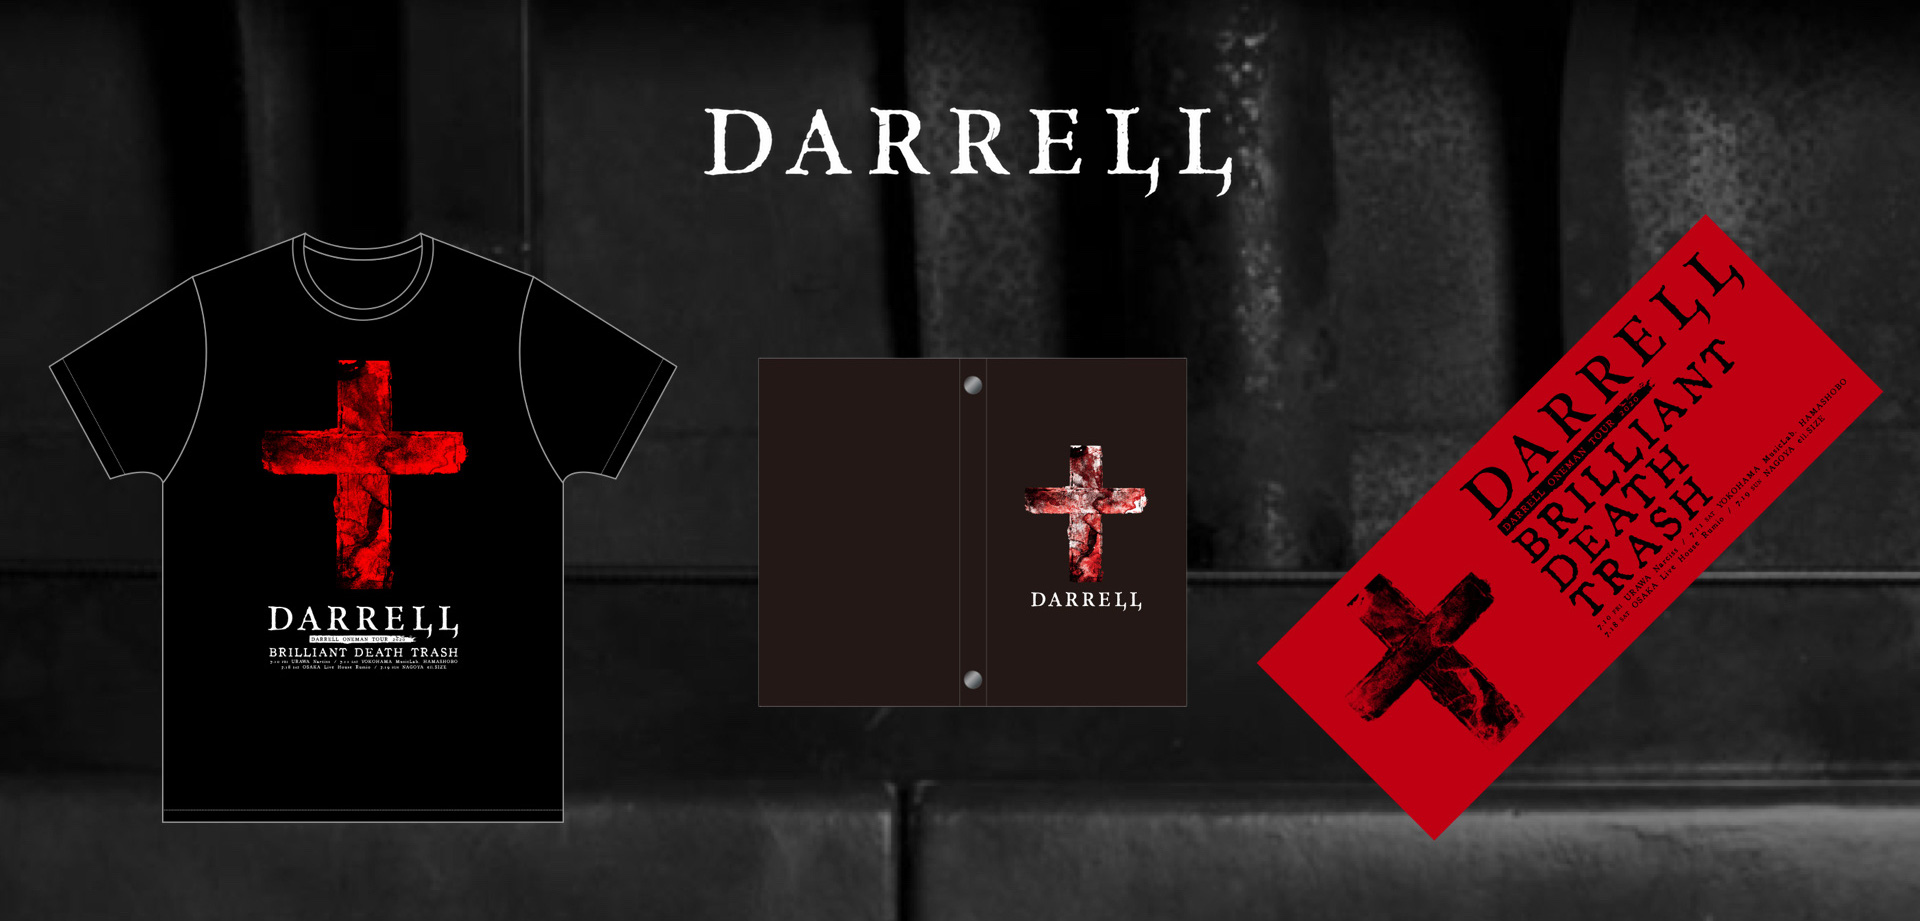 DARRELL_GoodsTour